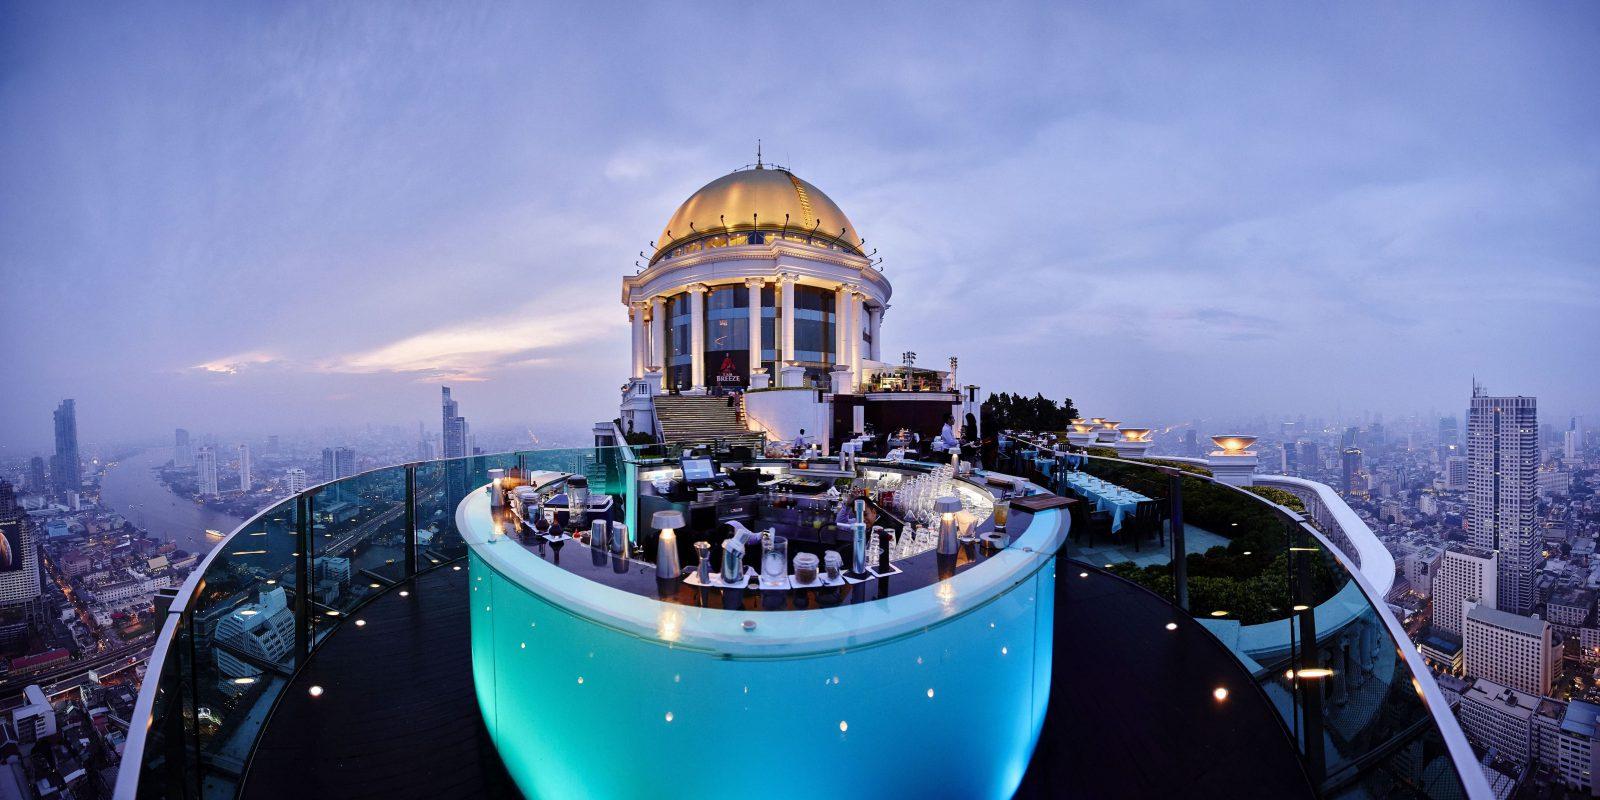 Sky Bar Building and Balcony Panorama